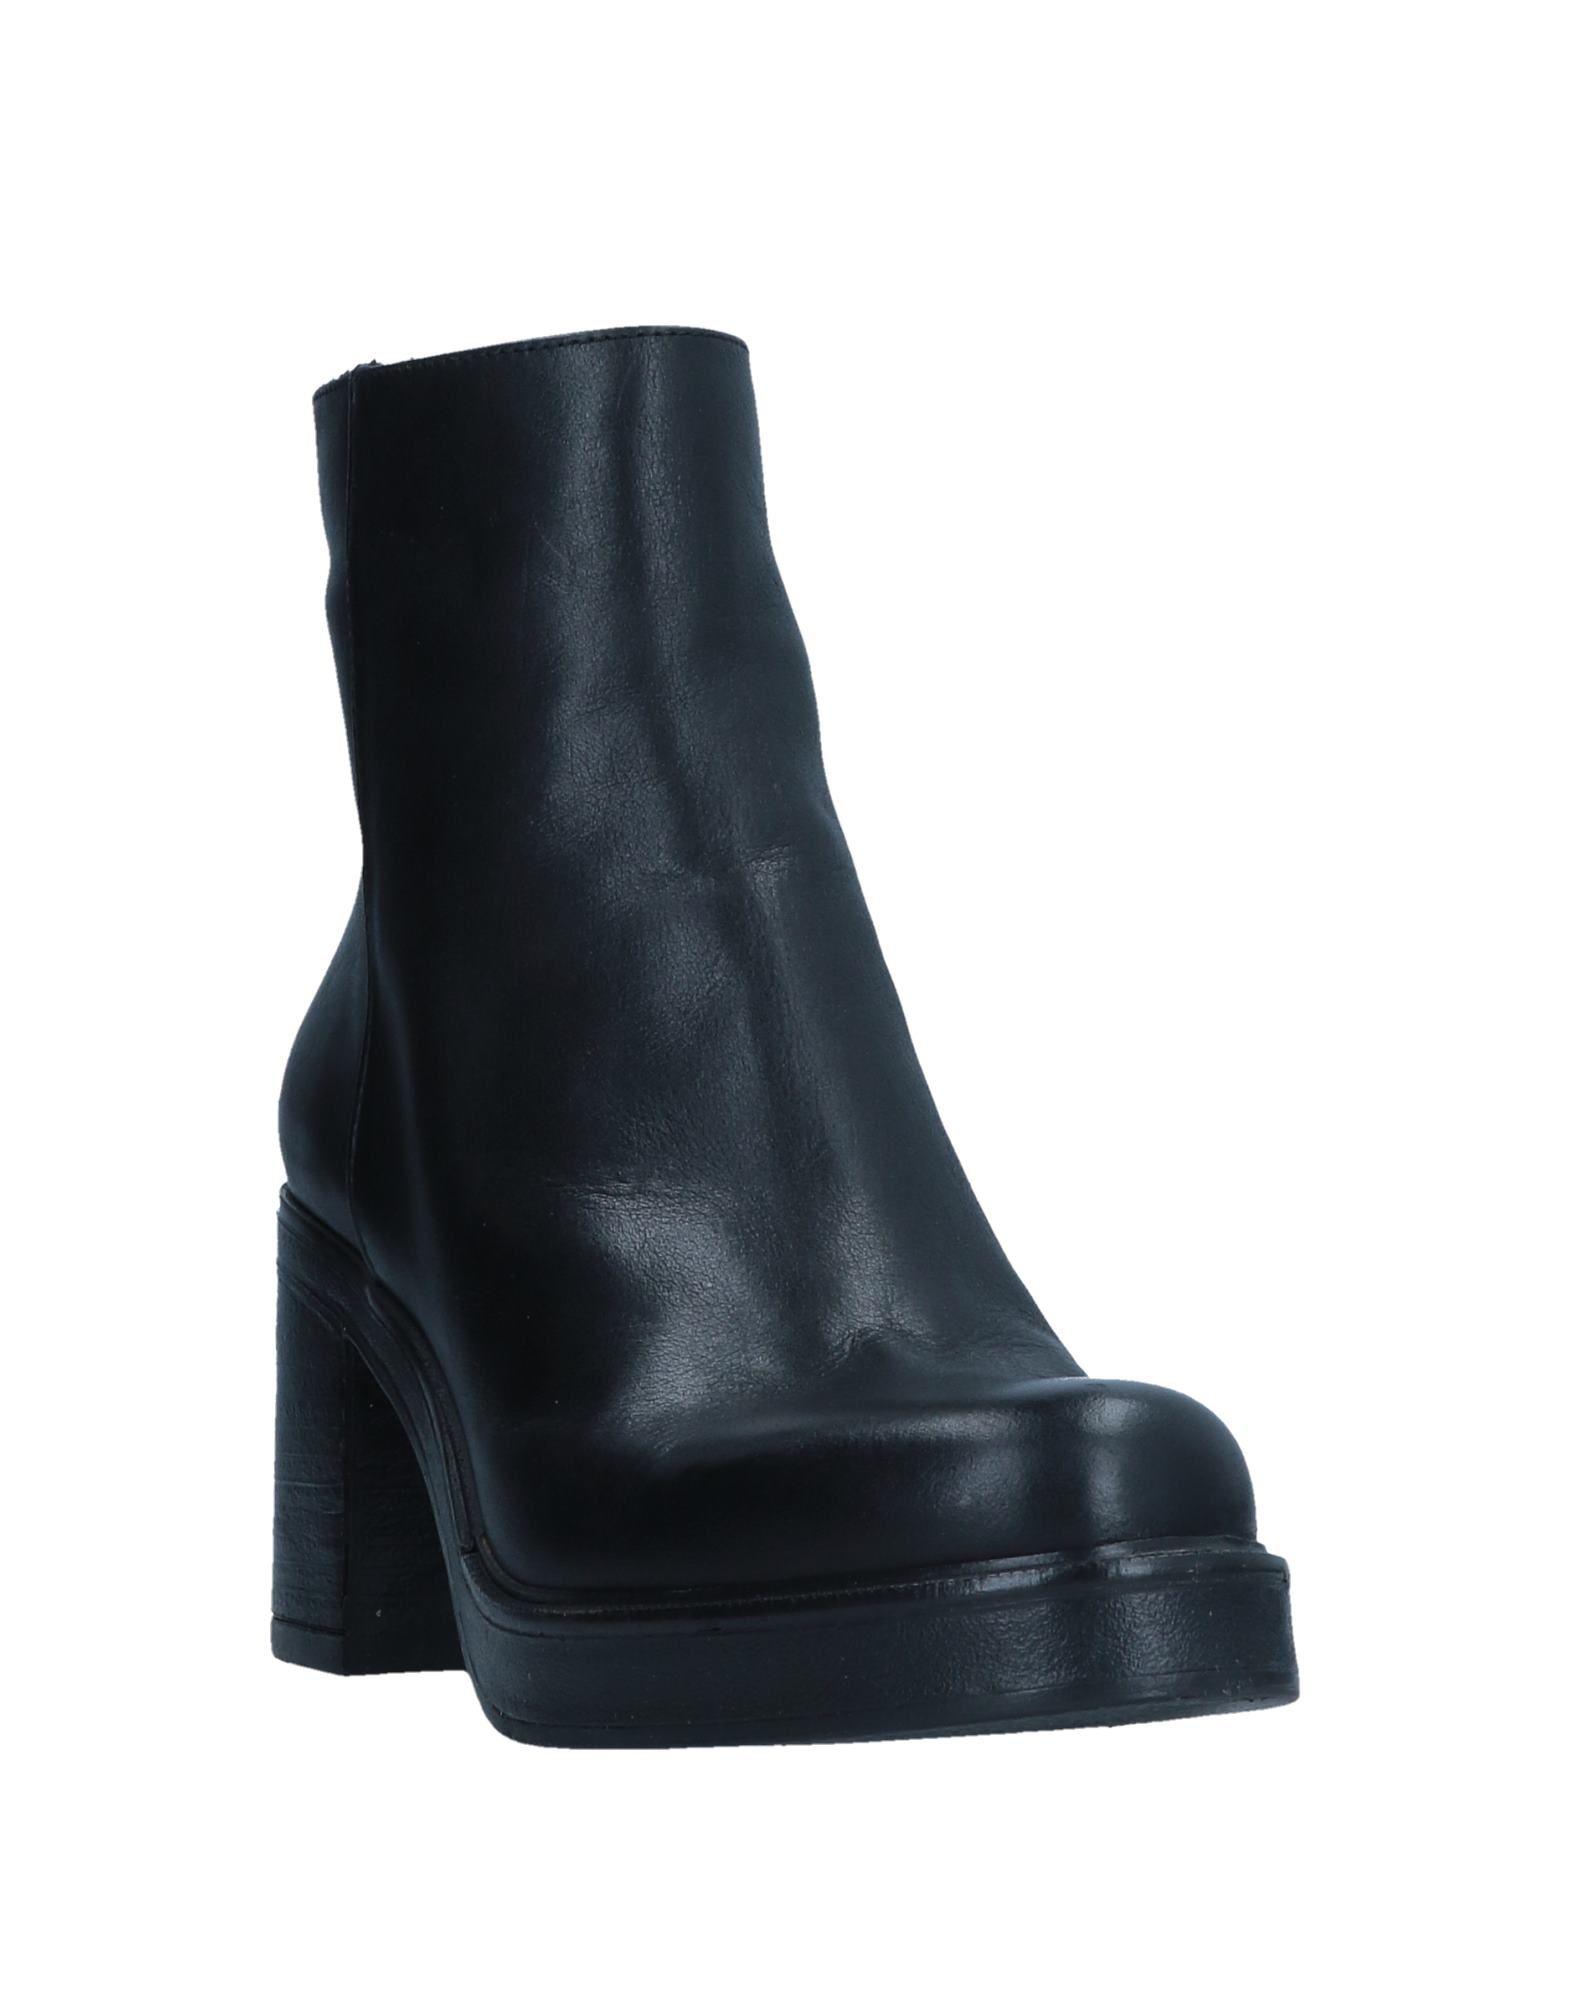 Gut um billige Dee Schuhe zu tragenJ D Julie Dee billige Stiefelette Damen  11550617CM f3d6b8